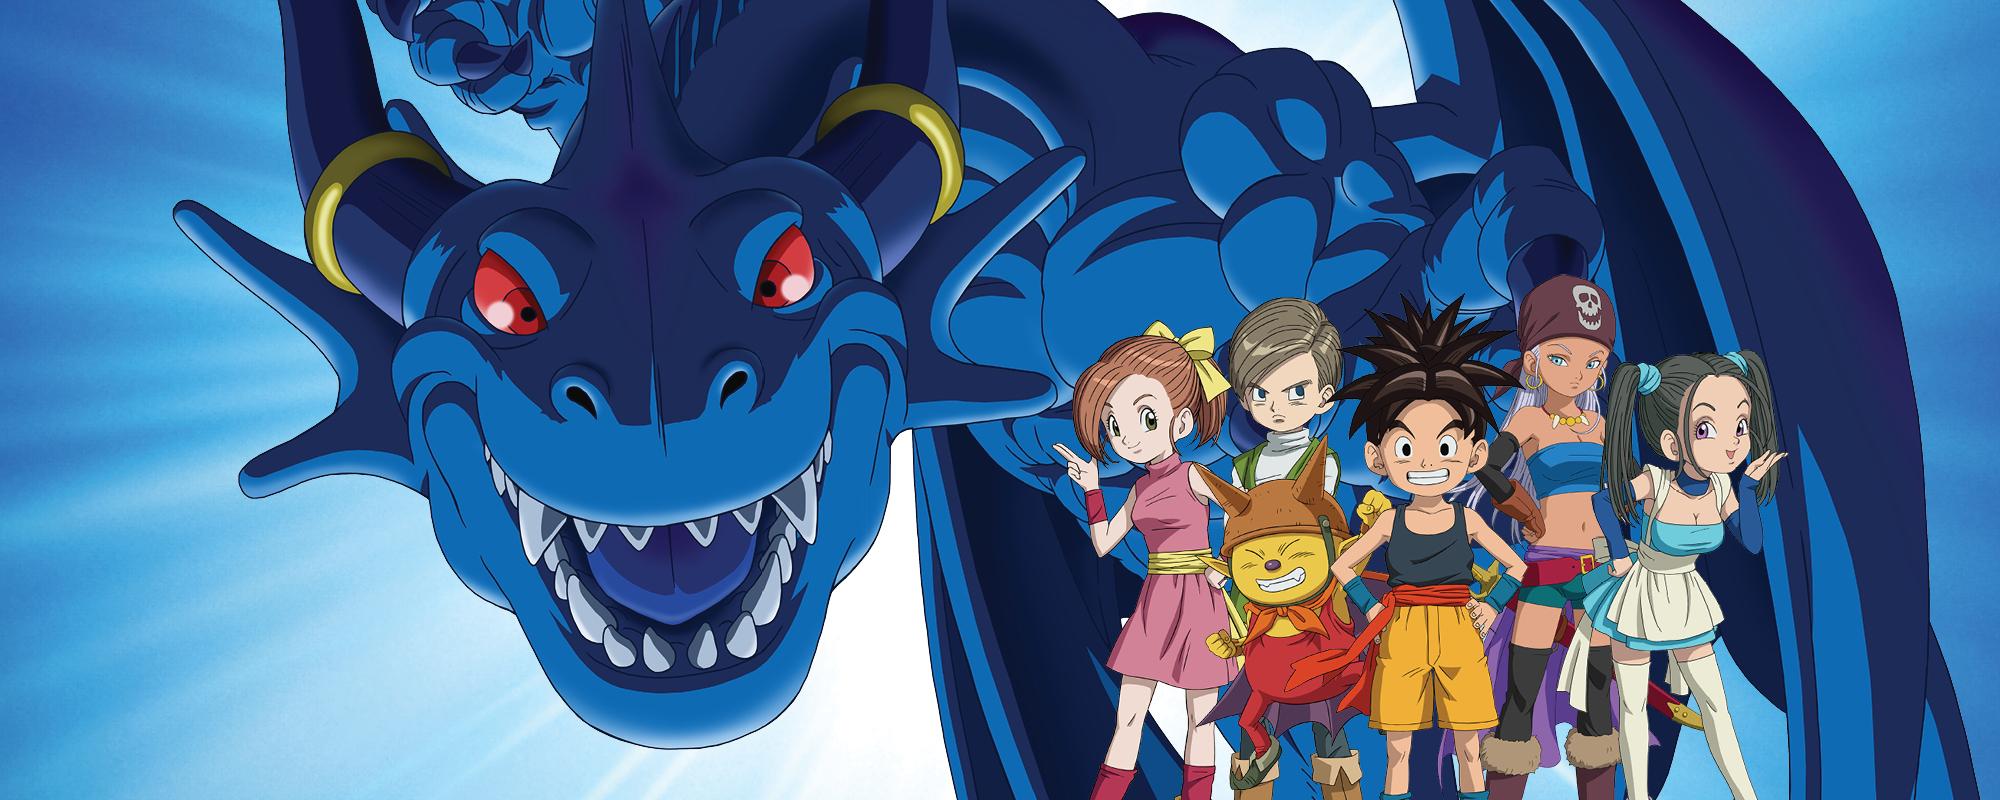 viz | the official website for blue dragon